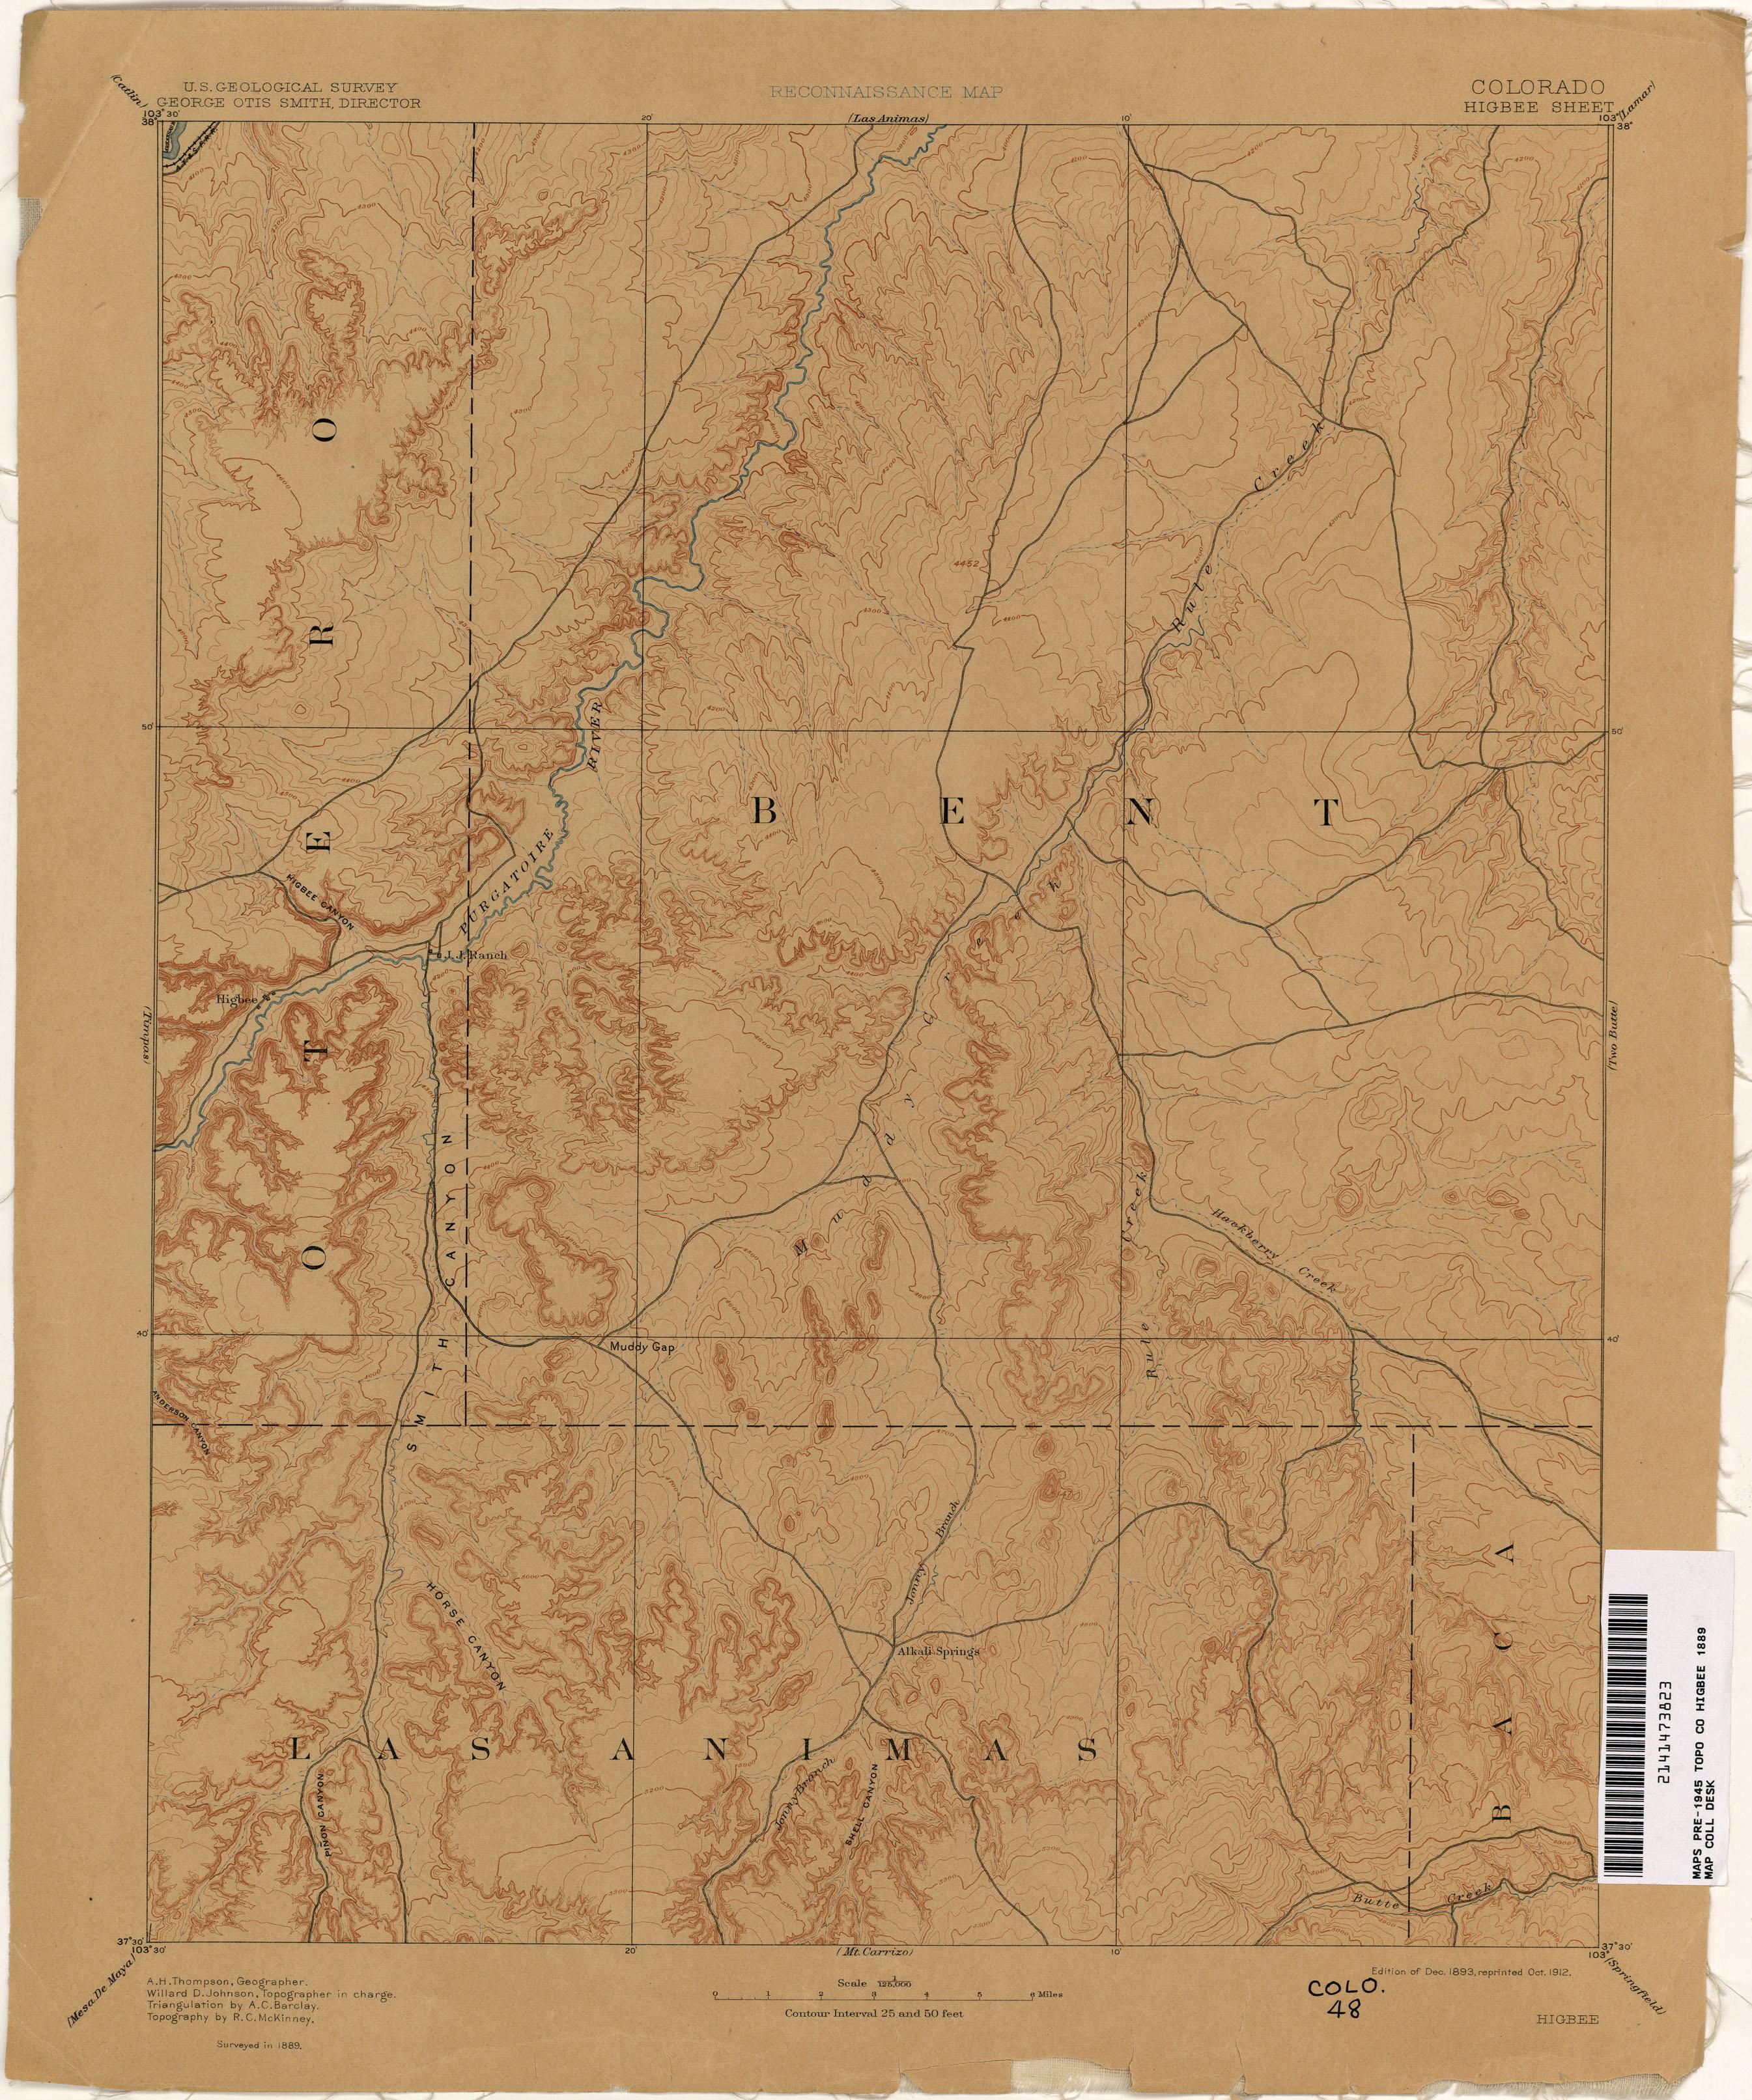 Springfield Colorado Map.Colorado Historical Topographic Maps Perry Castaneda Map